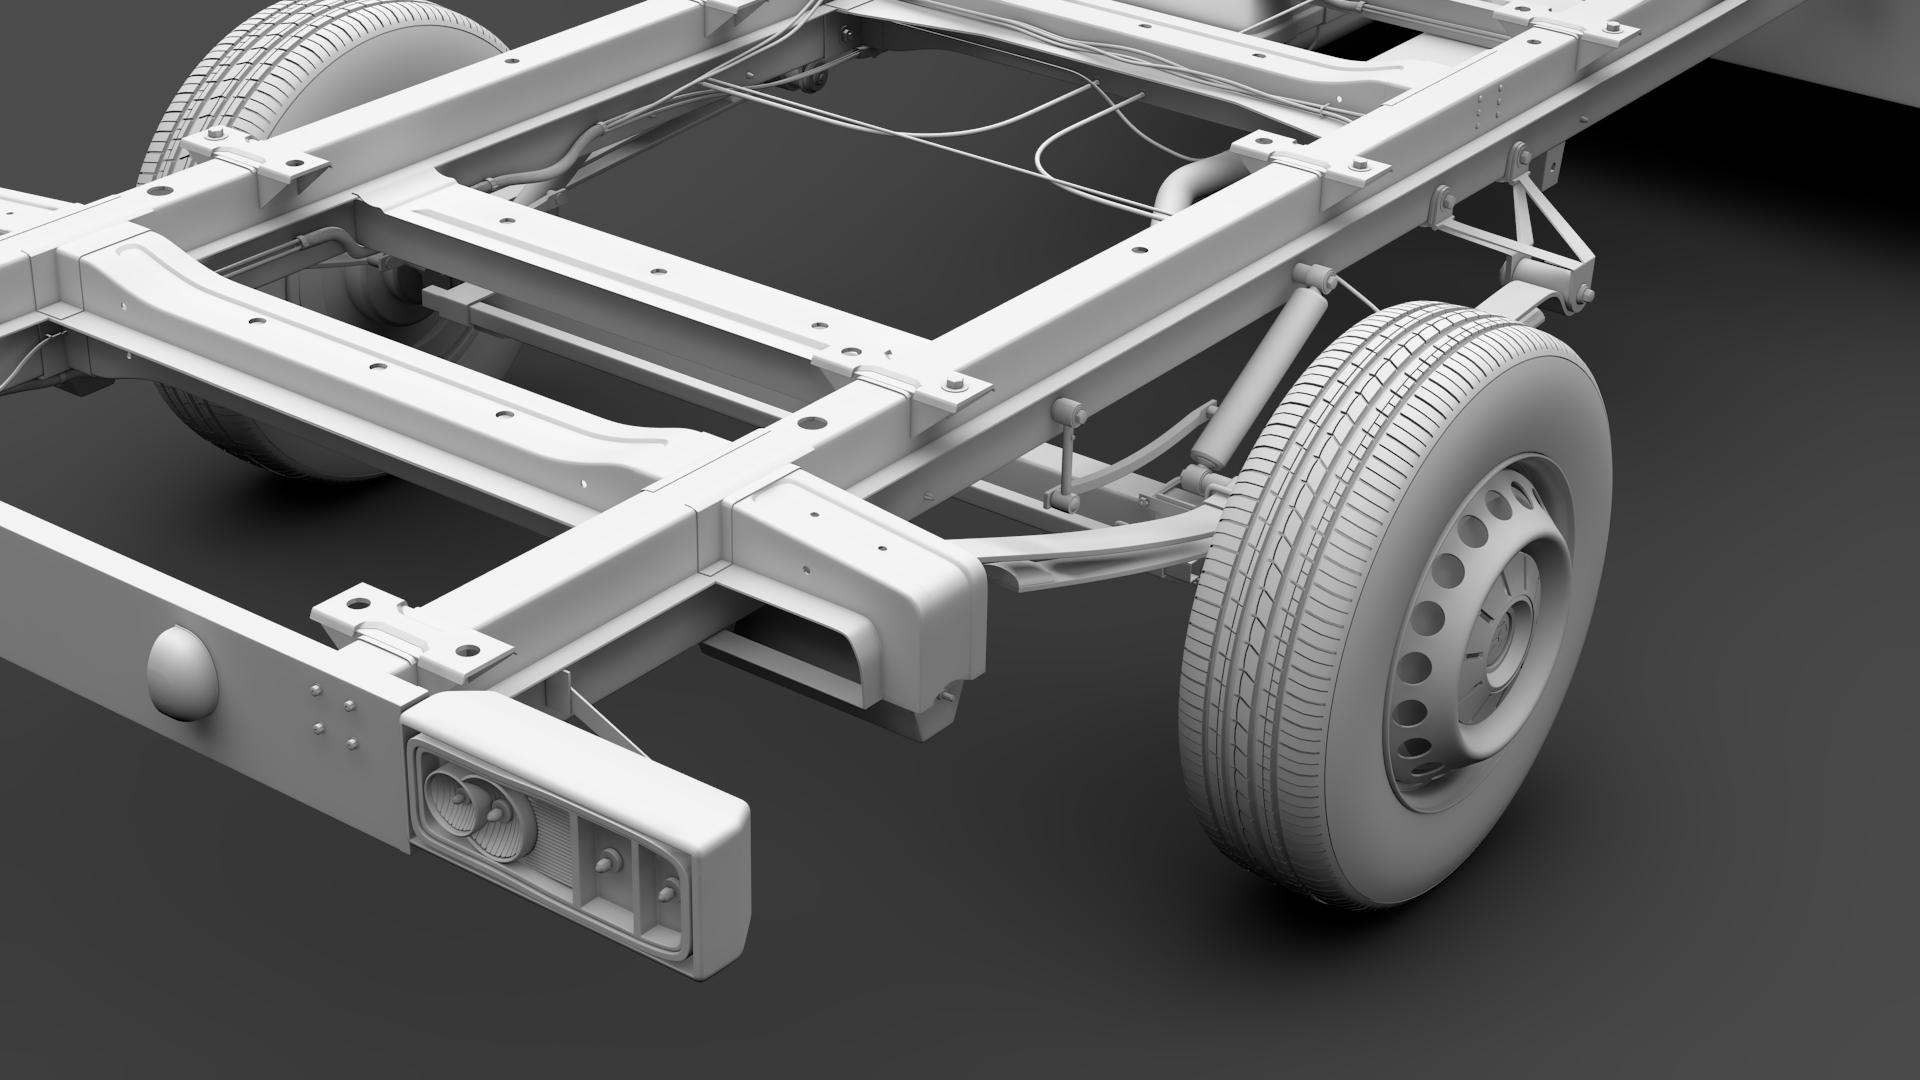 wv crafter chassis single-cab 2017 3d model max fbx c4d lwo ma mb hrc xsi obj 275102